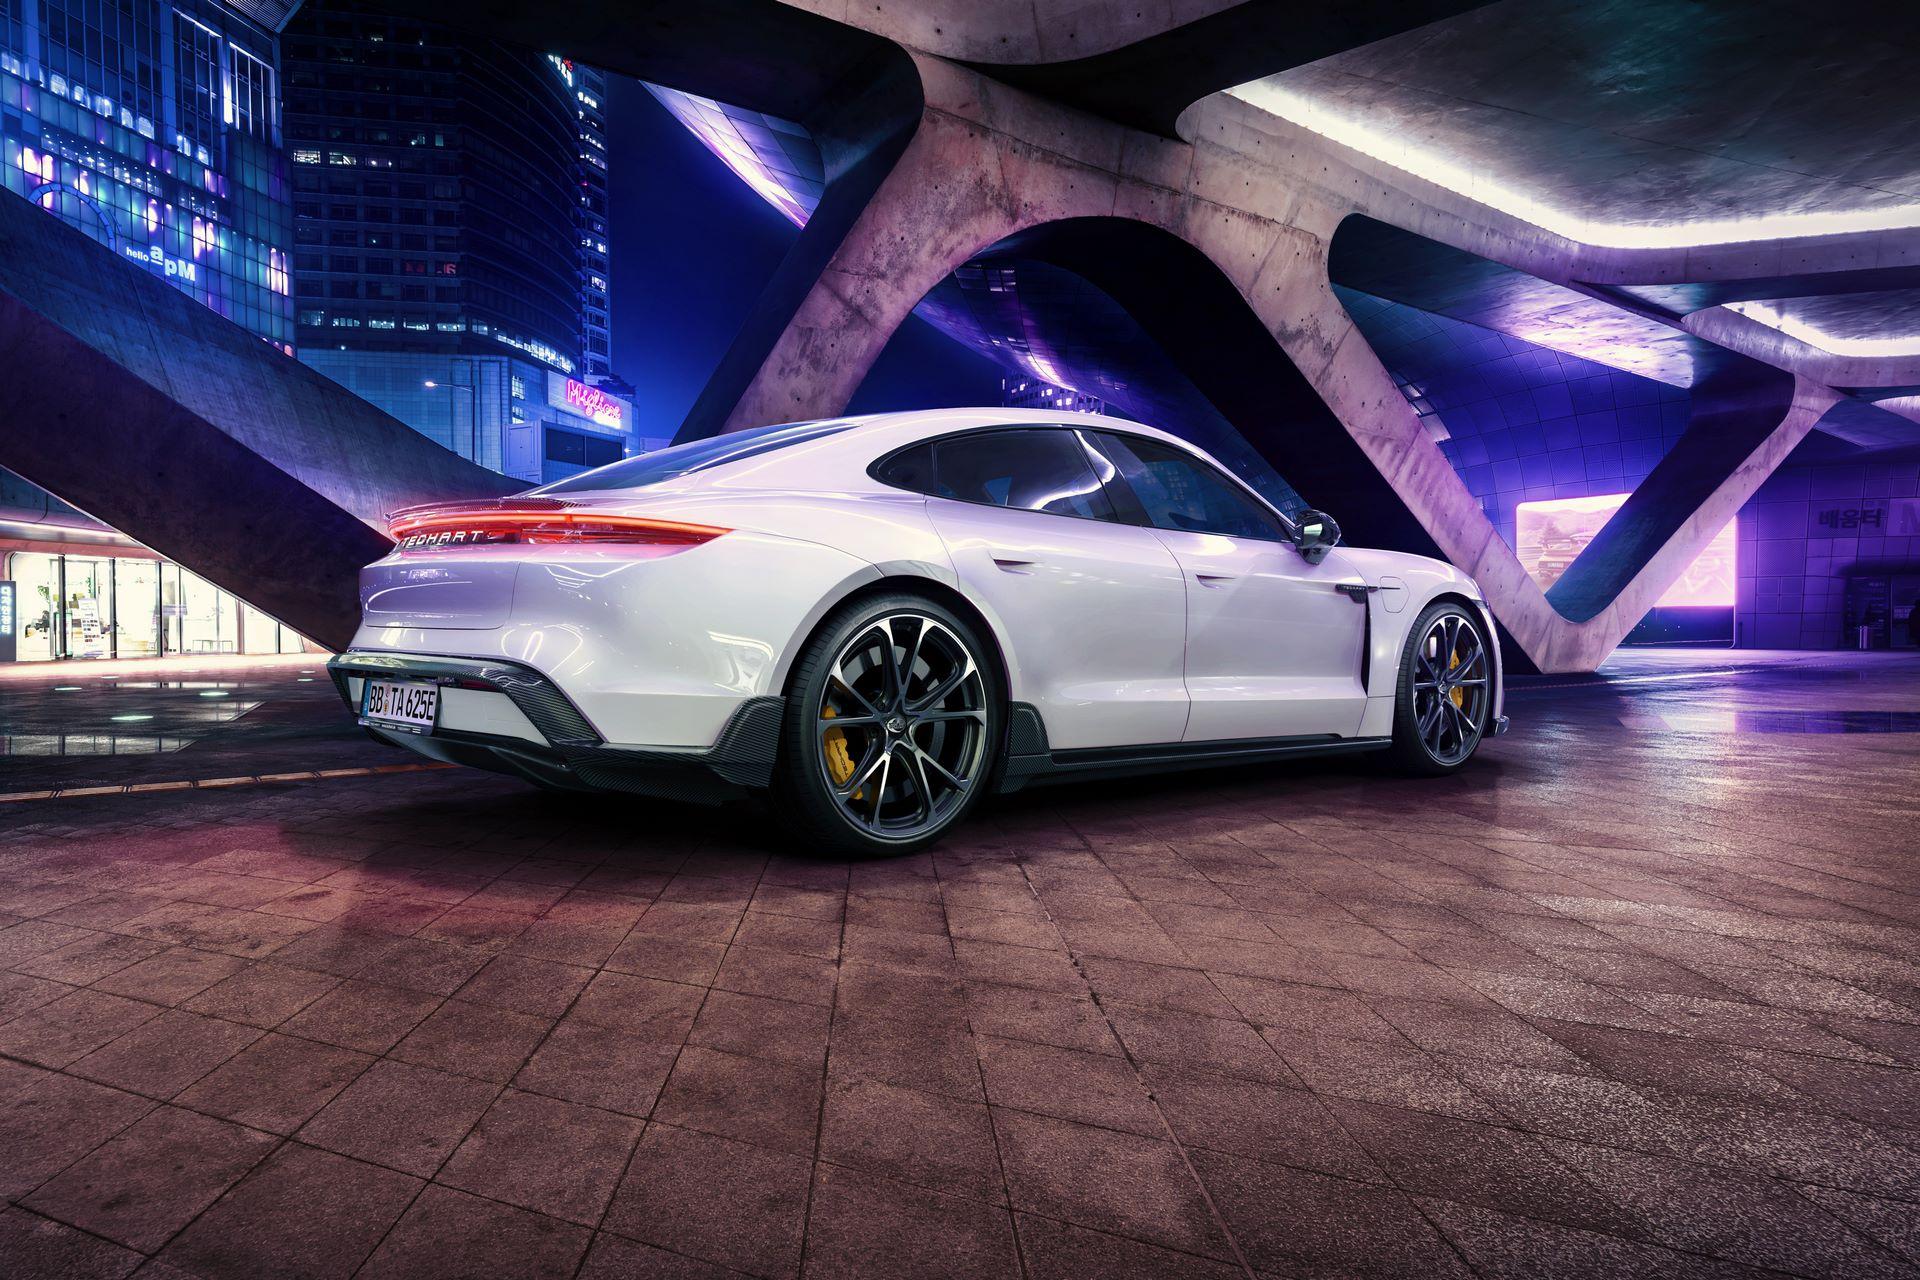 Porsche-Taycan-bodykit-by-TechArt-7